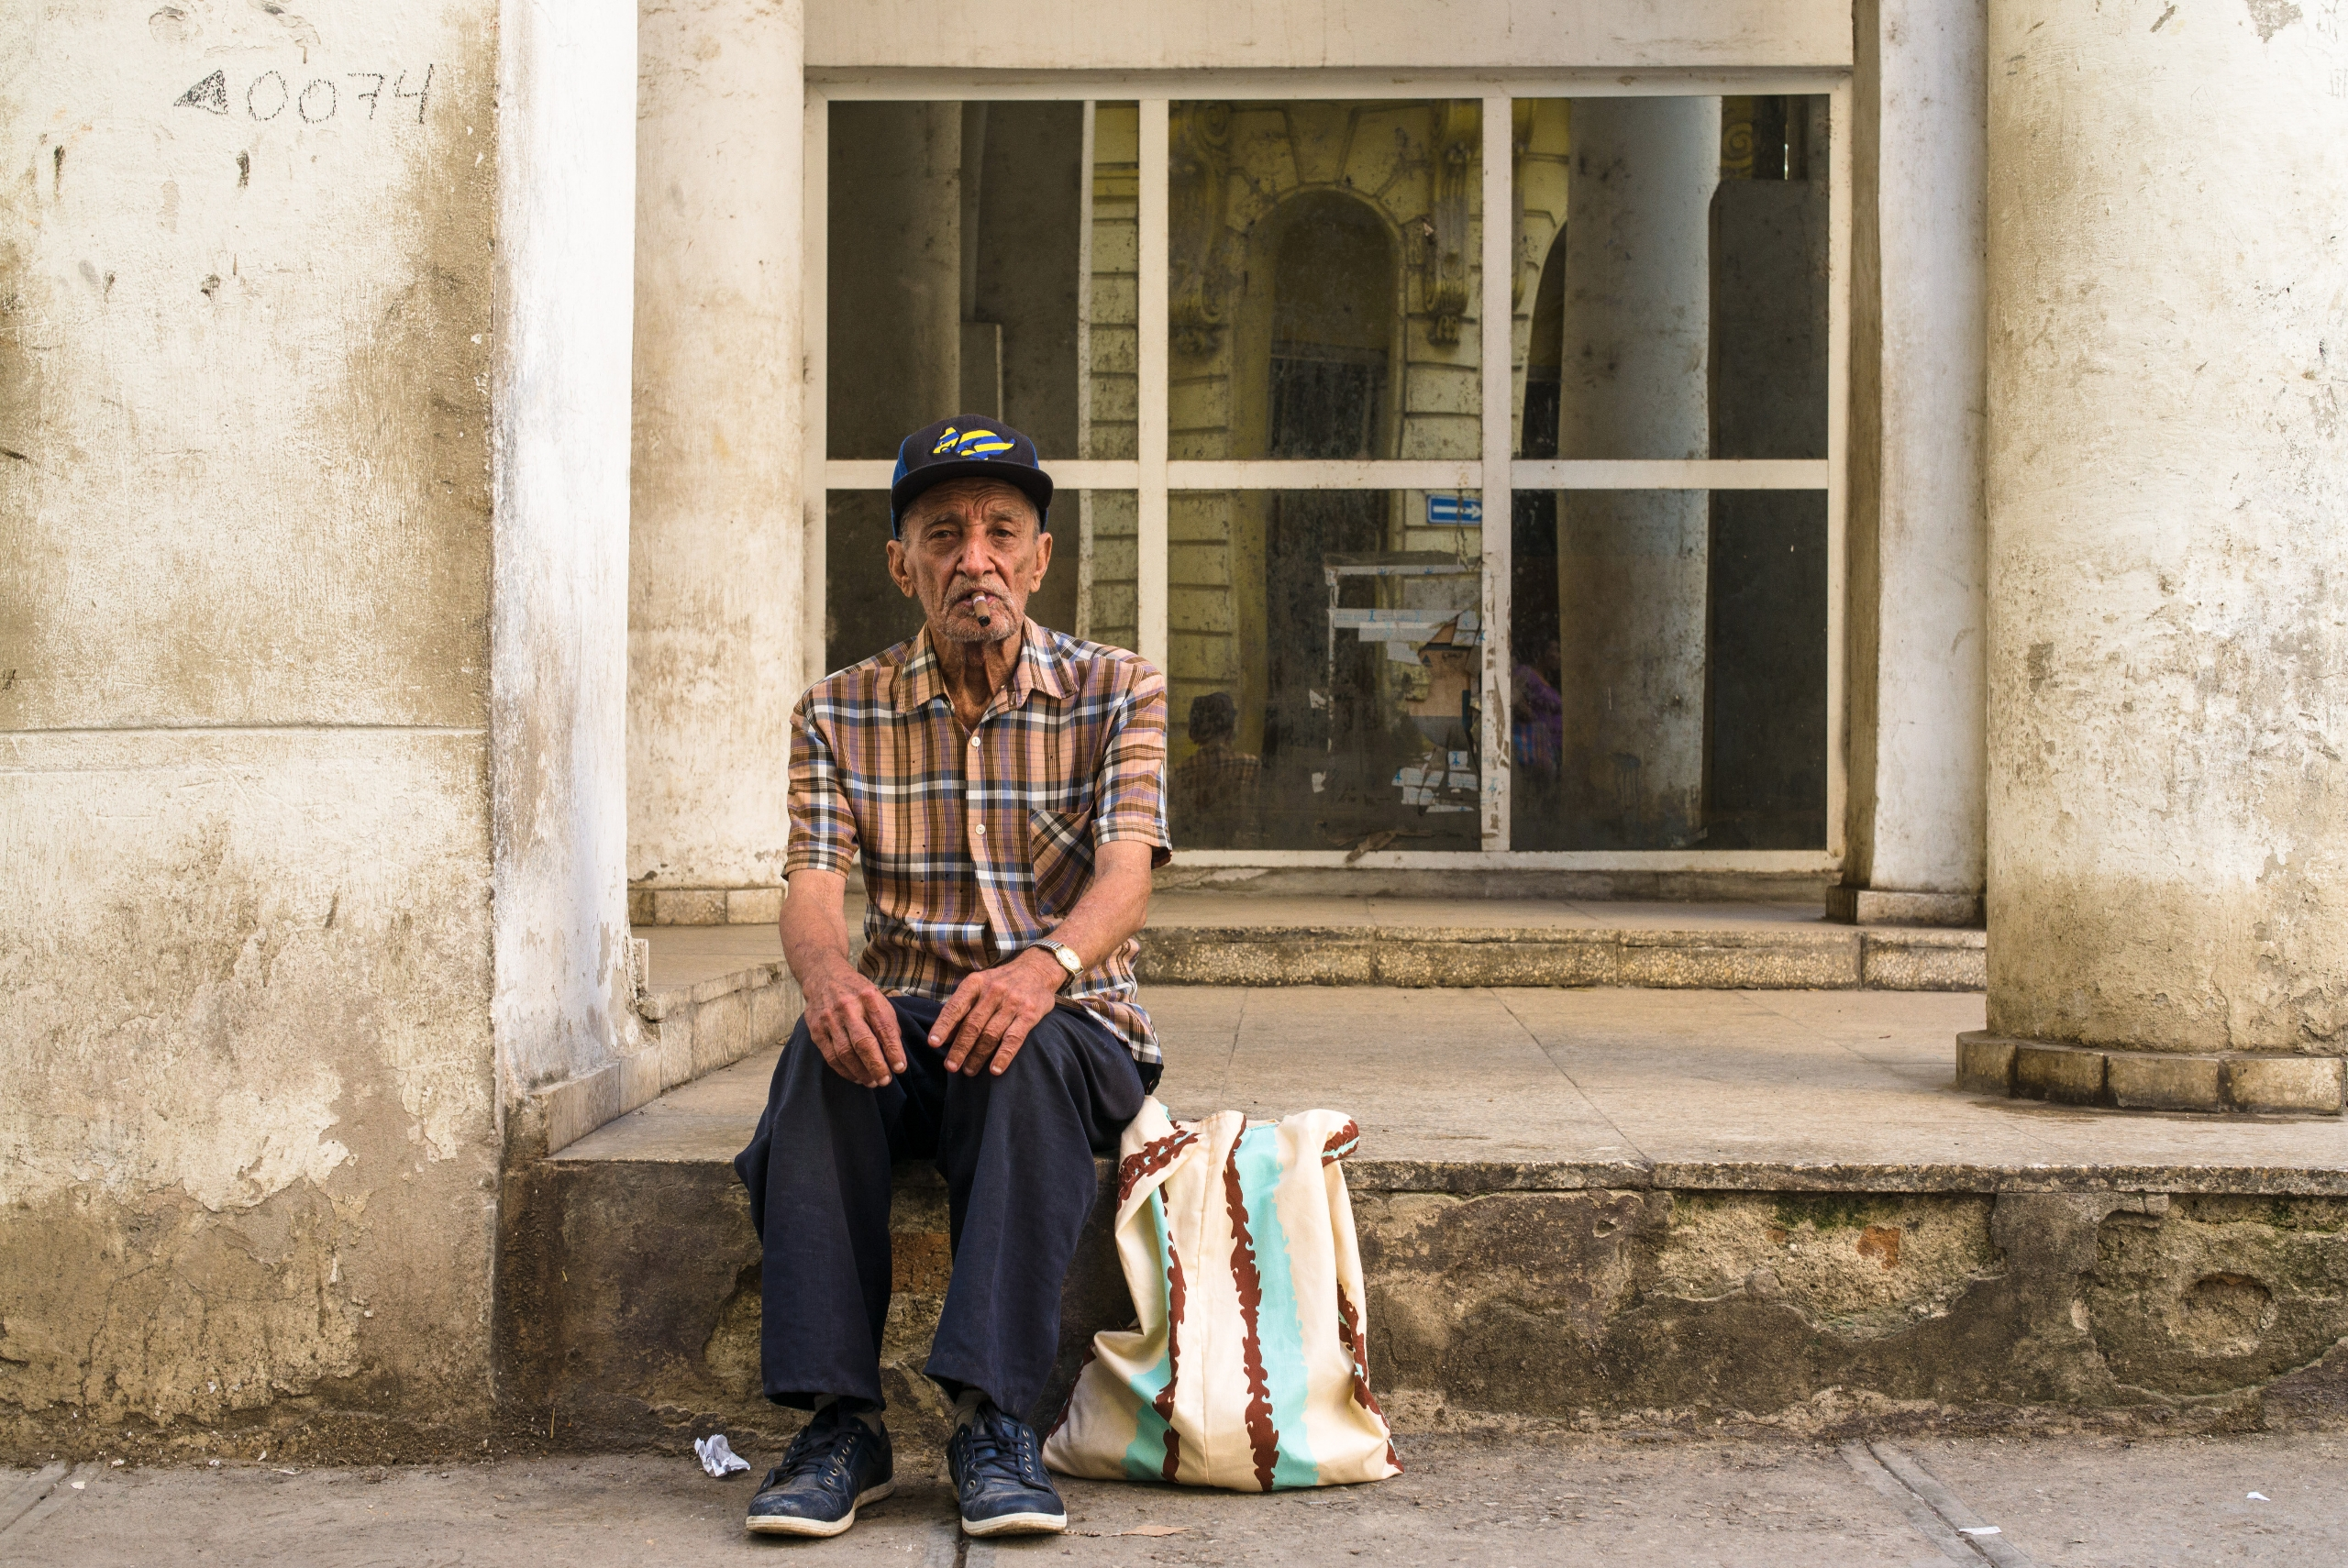 Smokeout Havana, Cuba - giseleduprez | ello